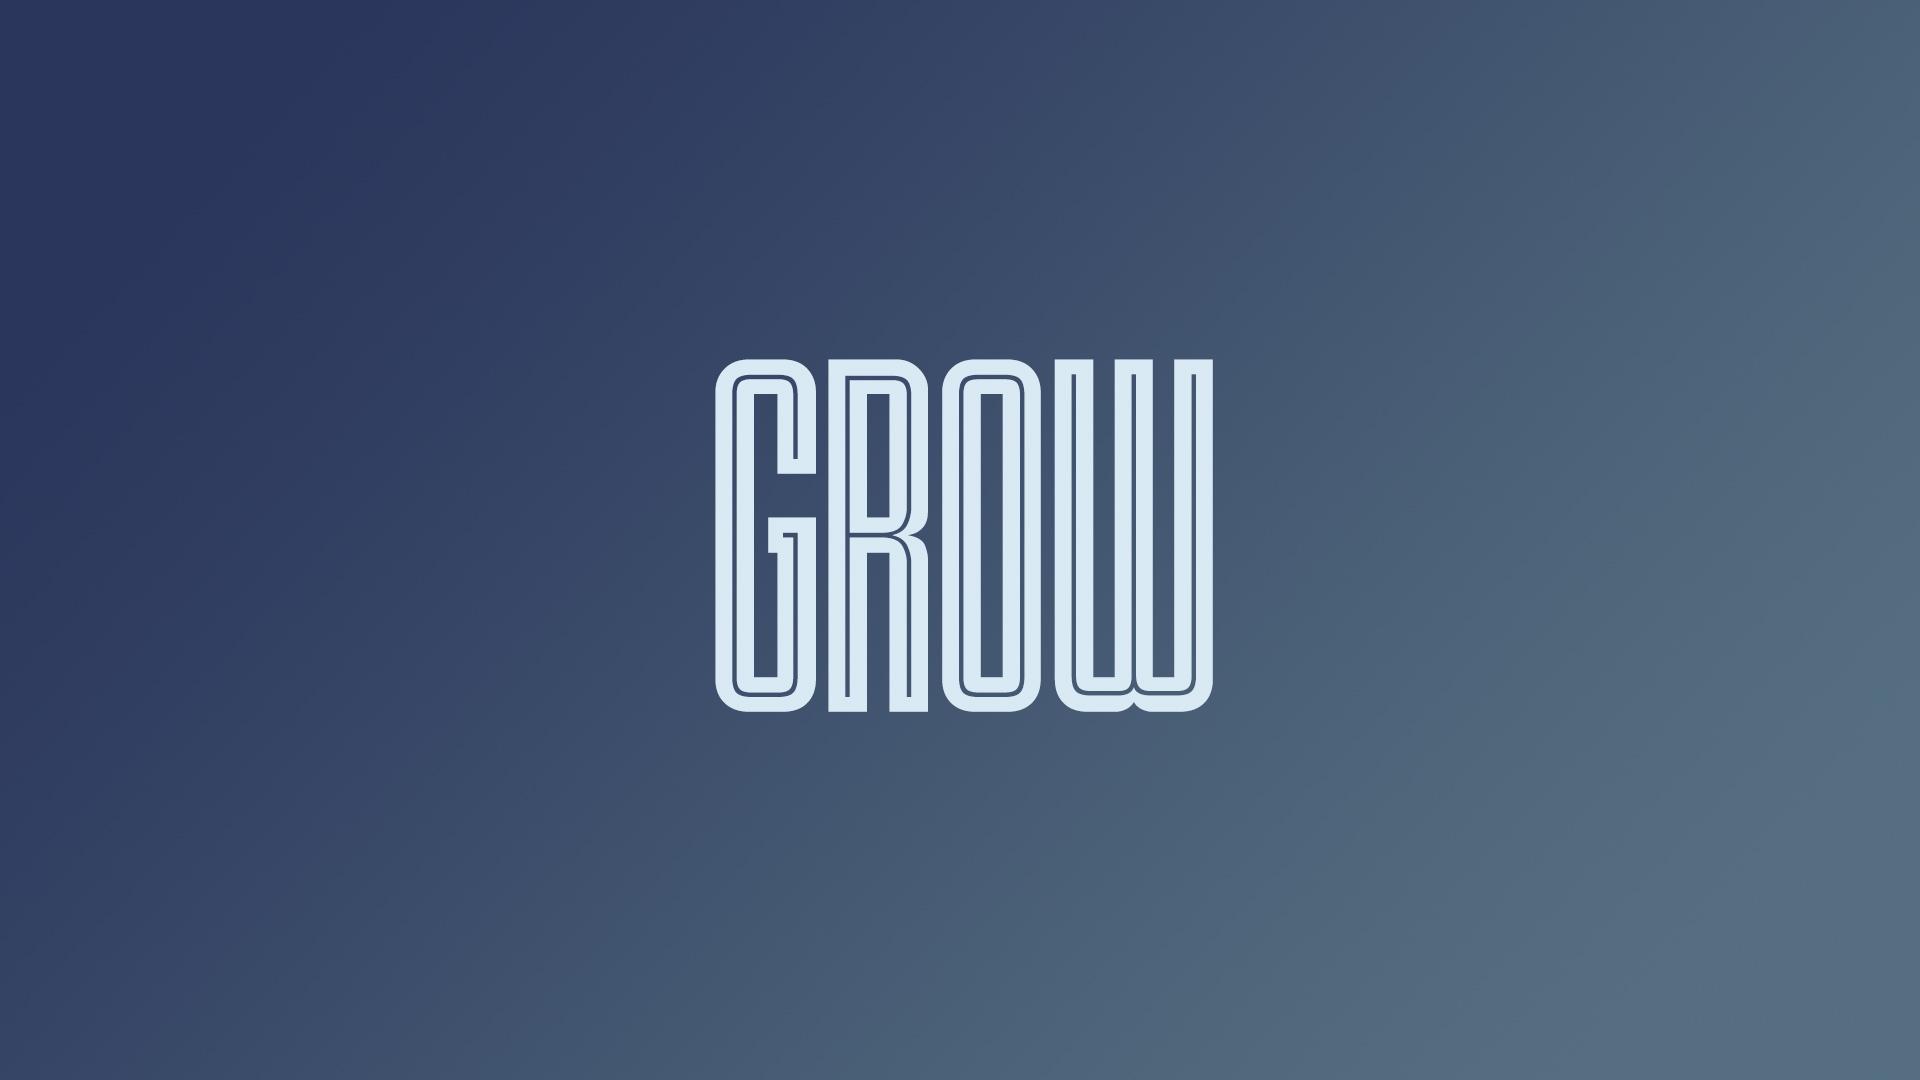 Website sermon - GROW.jpg